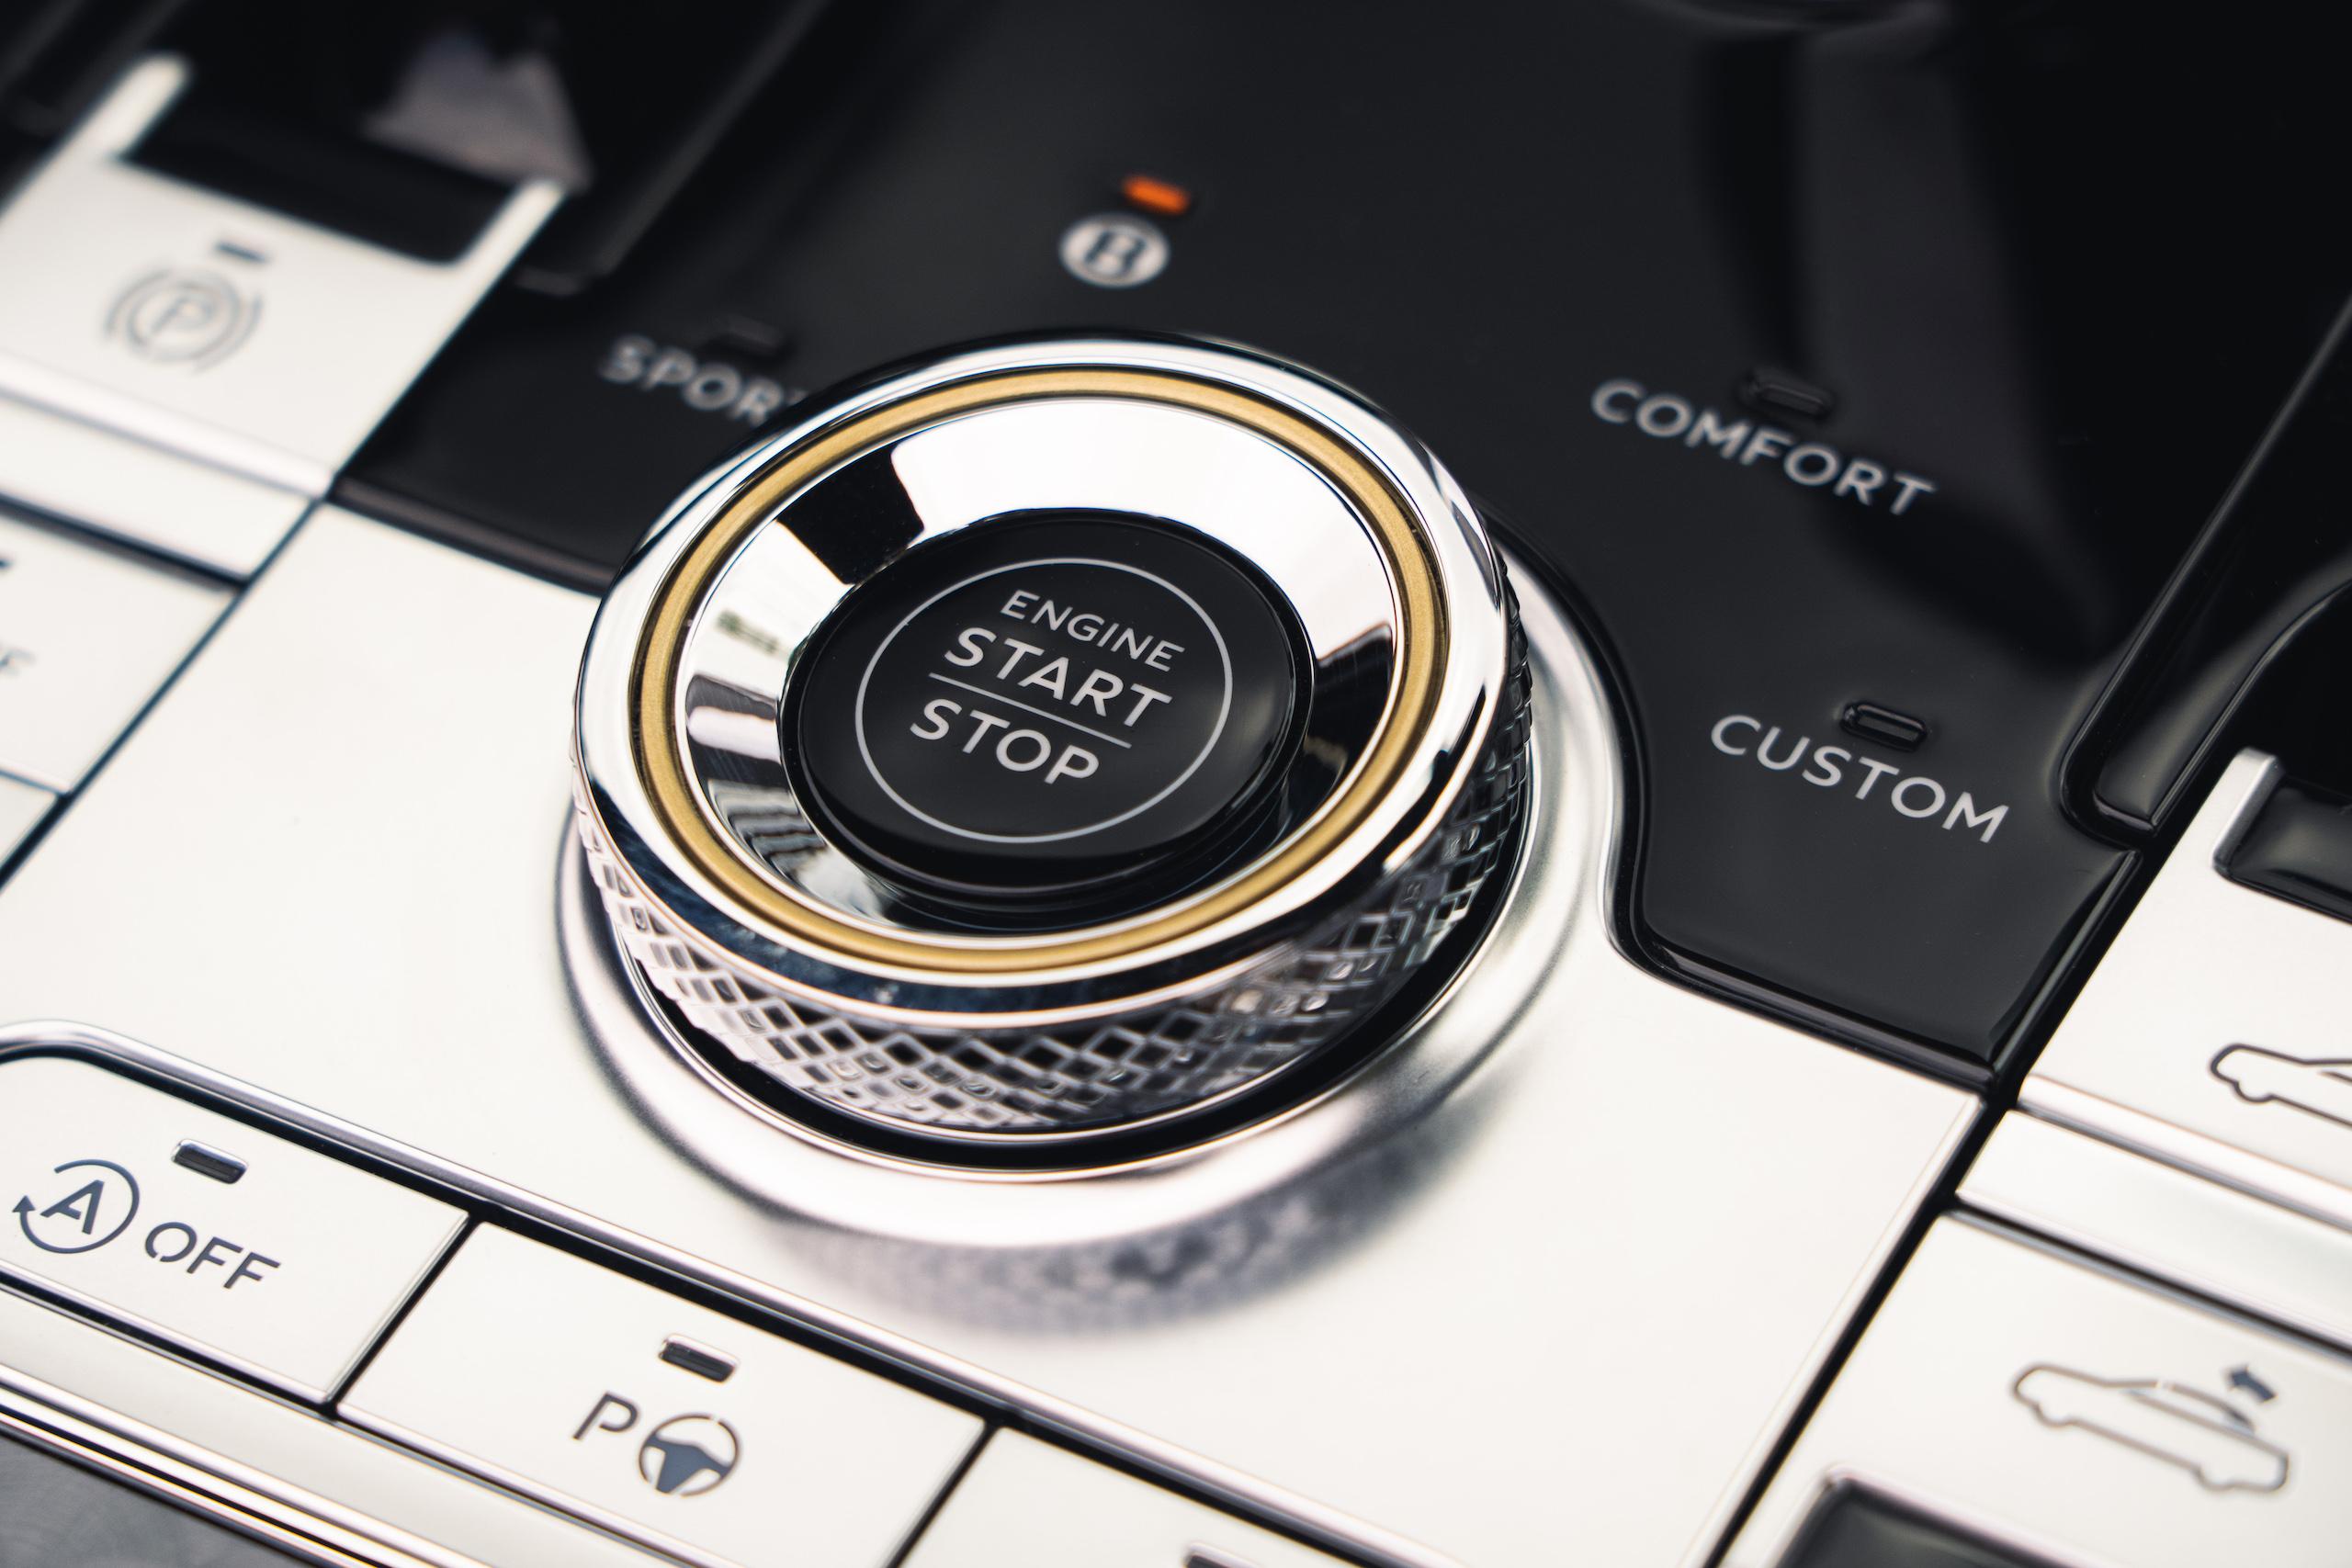 Bentley GT Speed Convertible console start stop dial